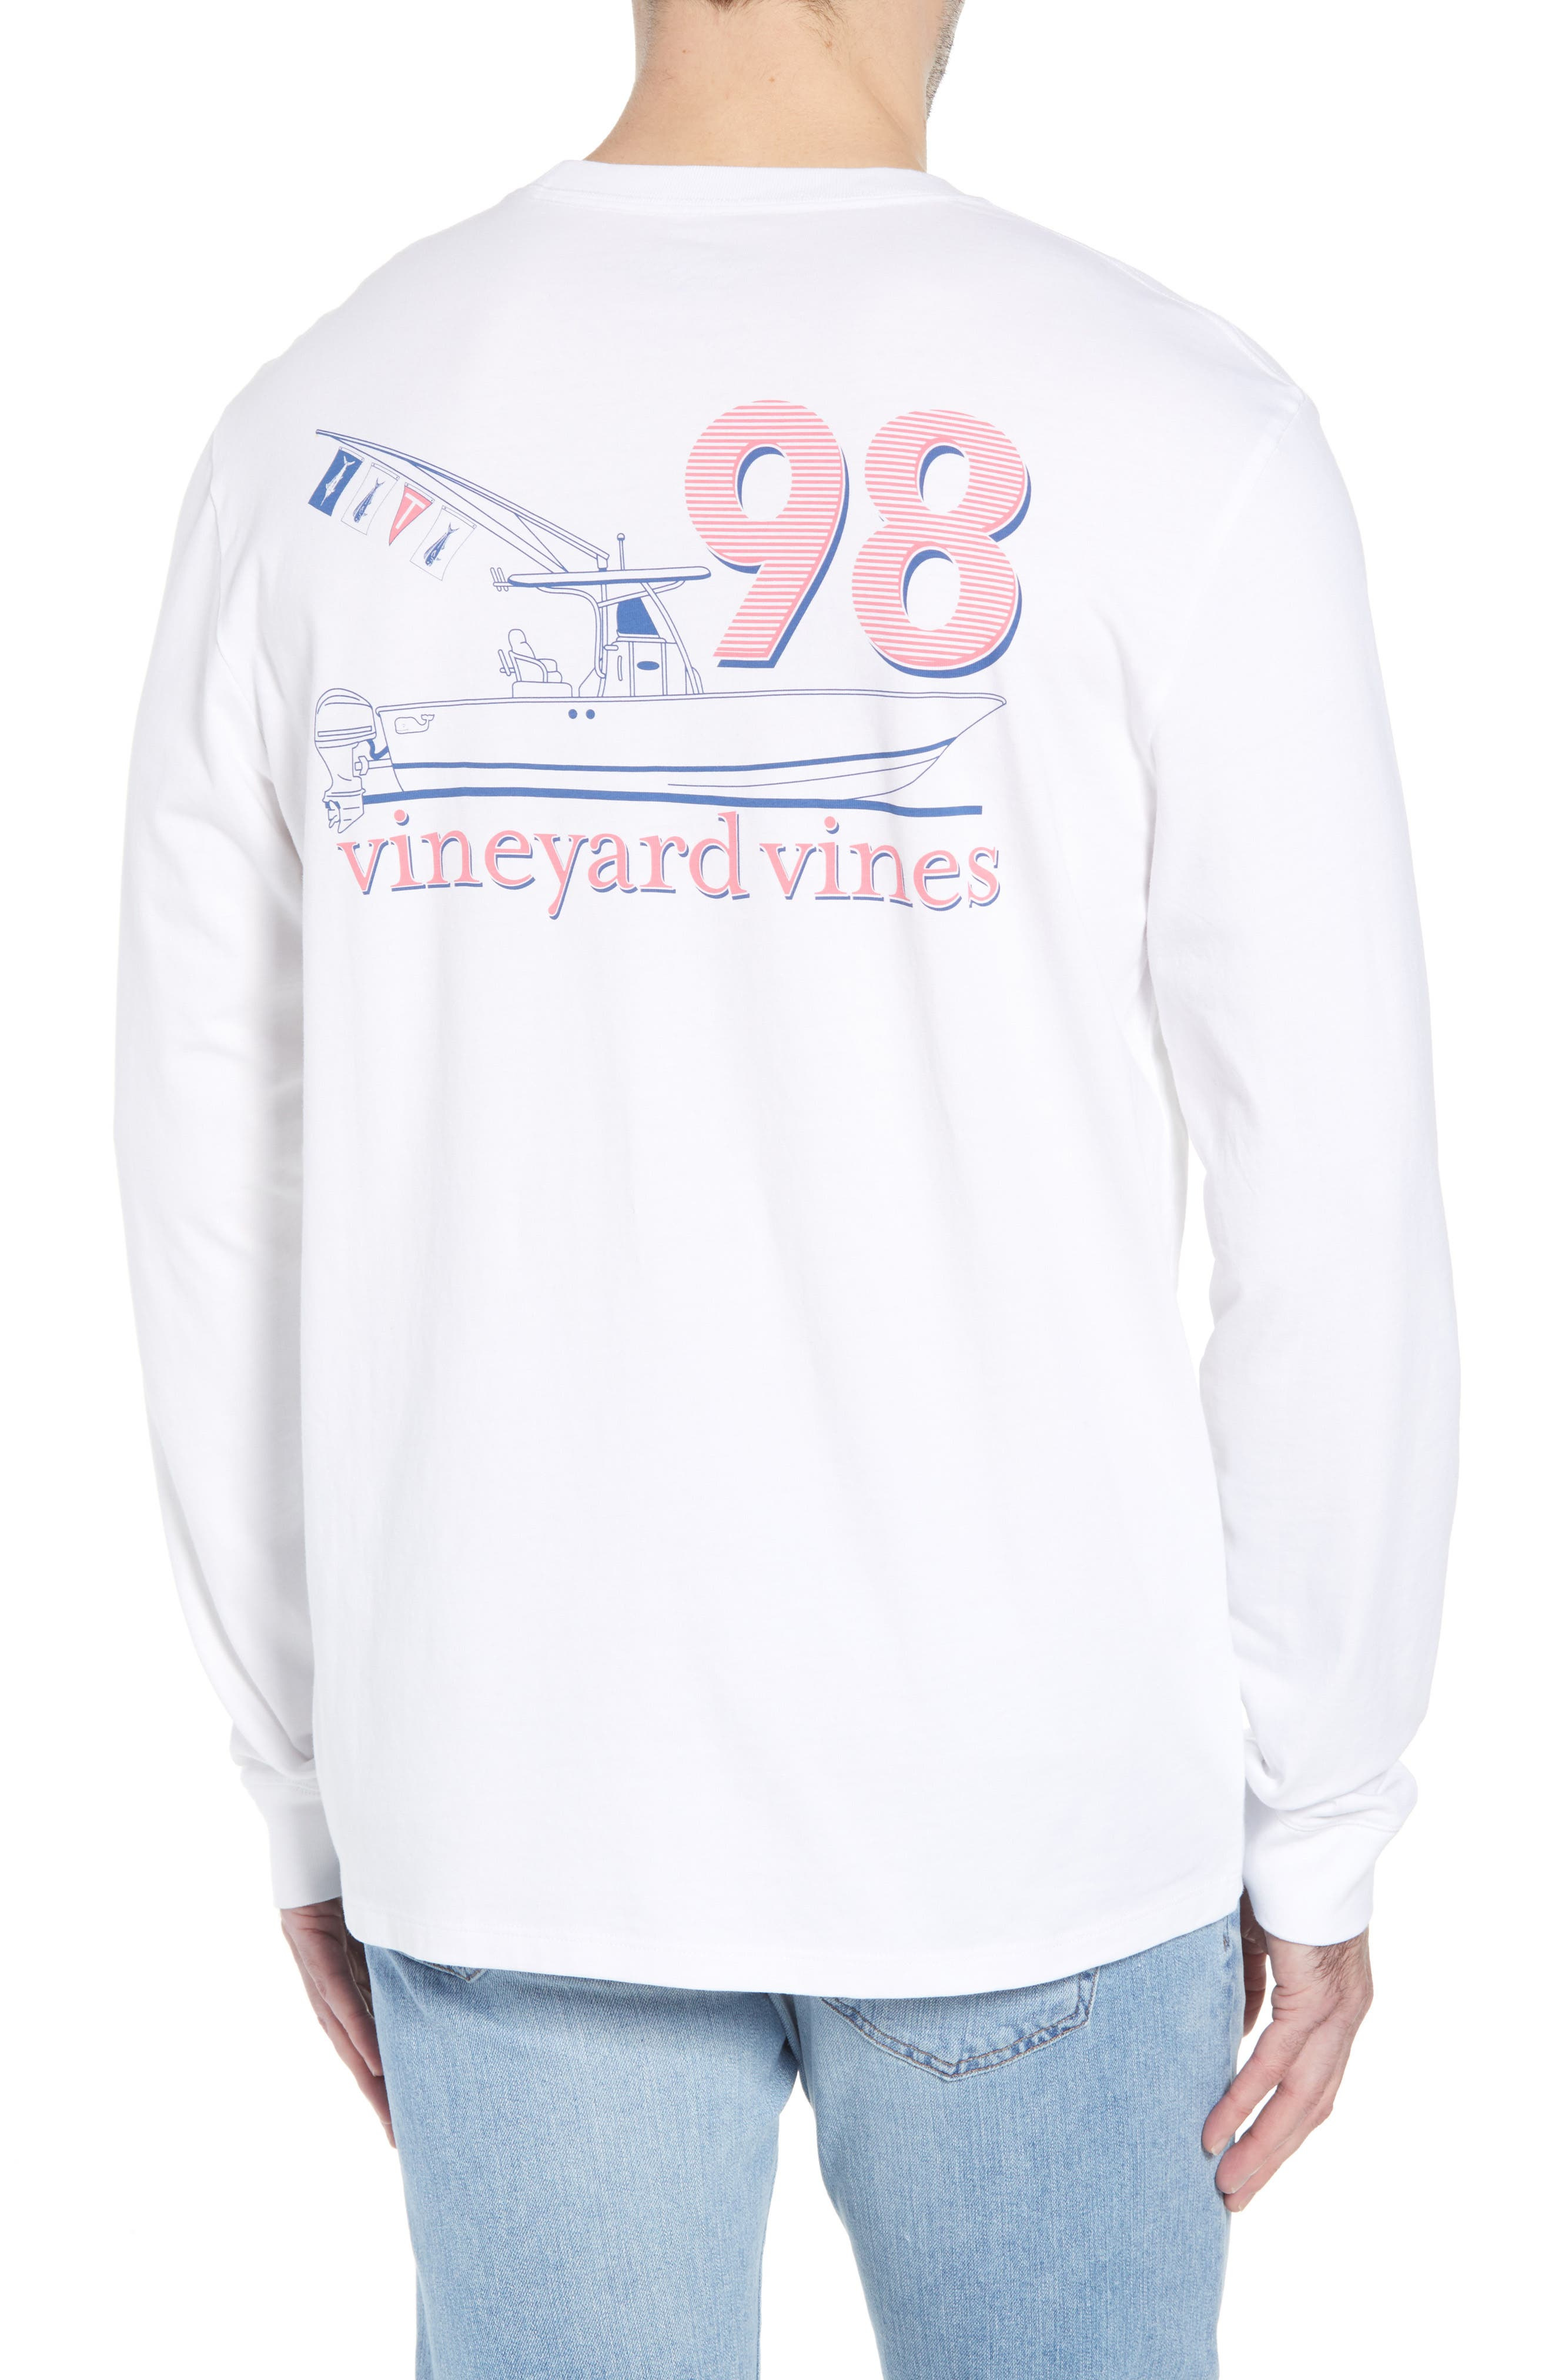 Sportfisher Regular Fit Crewneck T-Shirt,                             Alternate thumbnail 2, color,